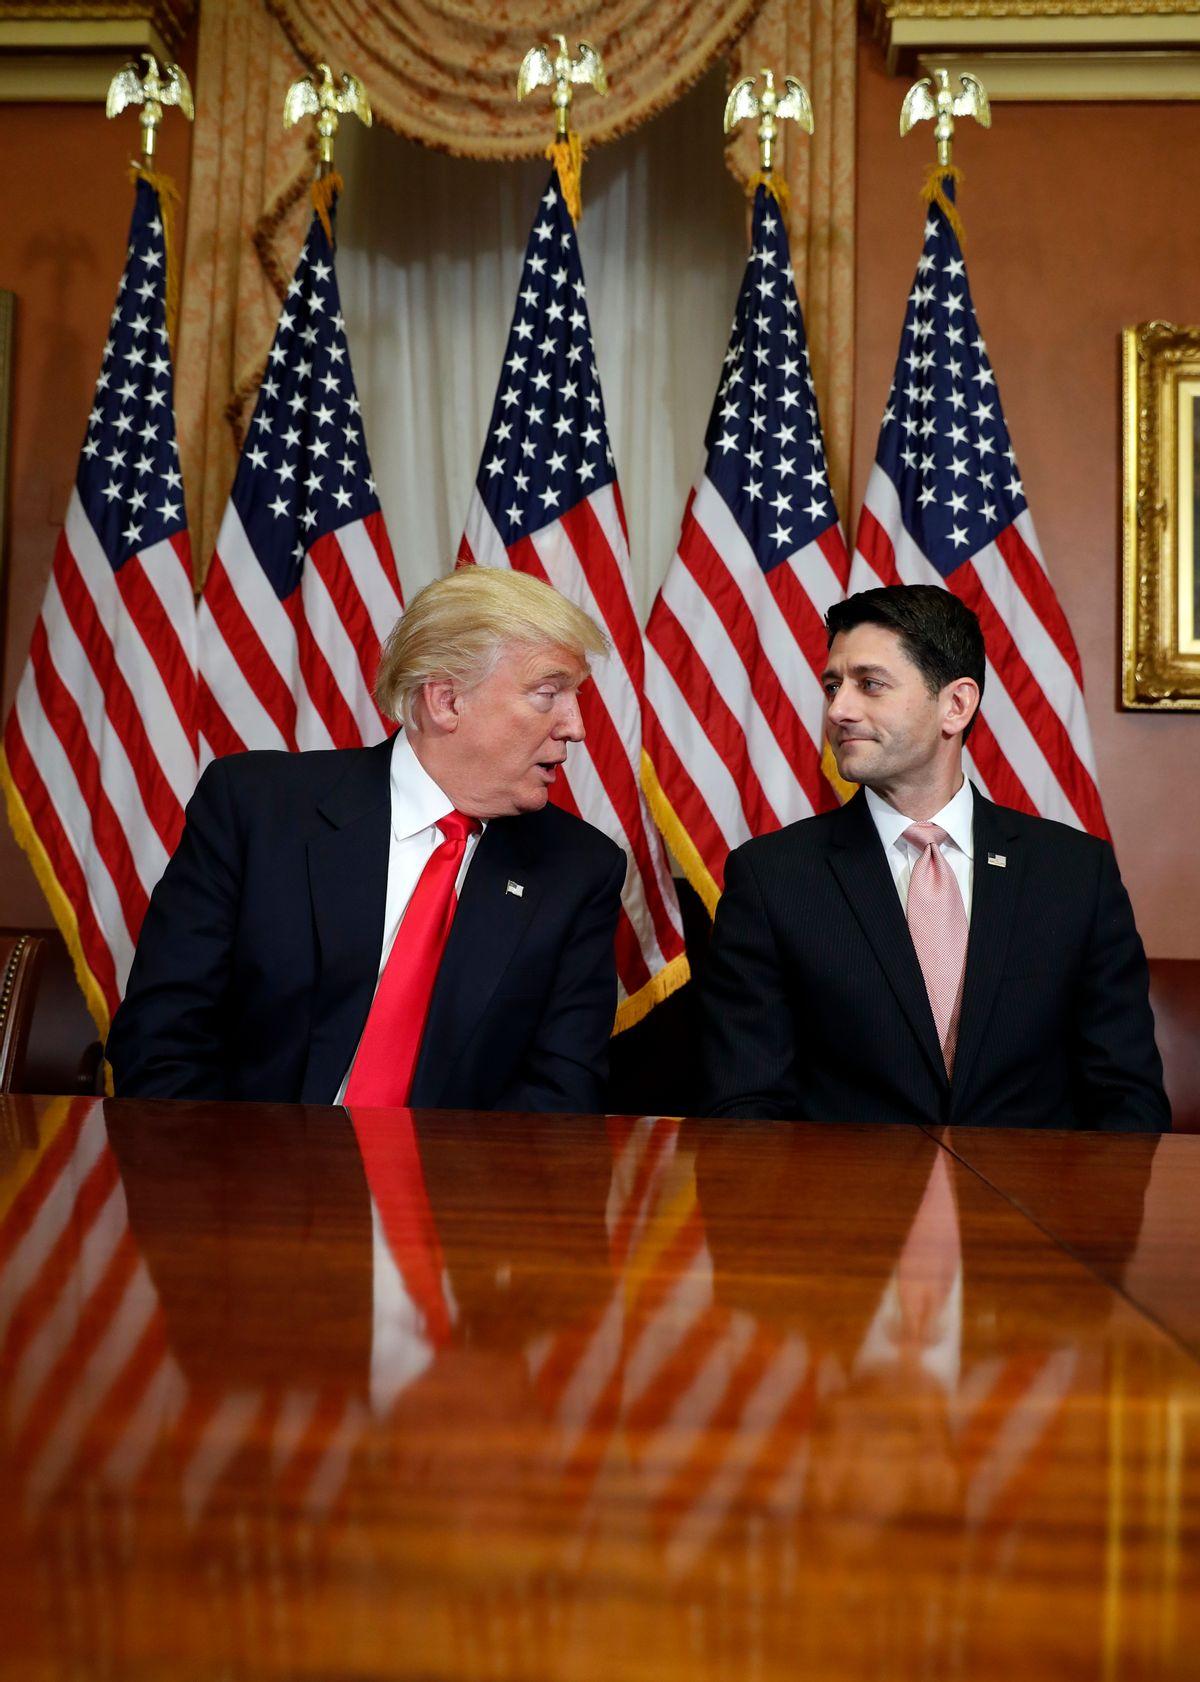 President-elect Donald Trump talks with House Speaker Paul Ryan of Wis. on Capitol Hill in Washington, Thursday, Nov. 10, 2016. () (AP Photo/Alex Brandon)